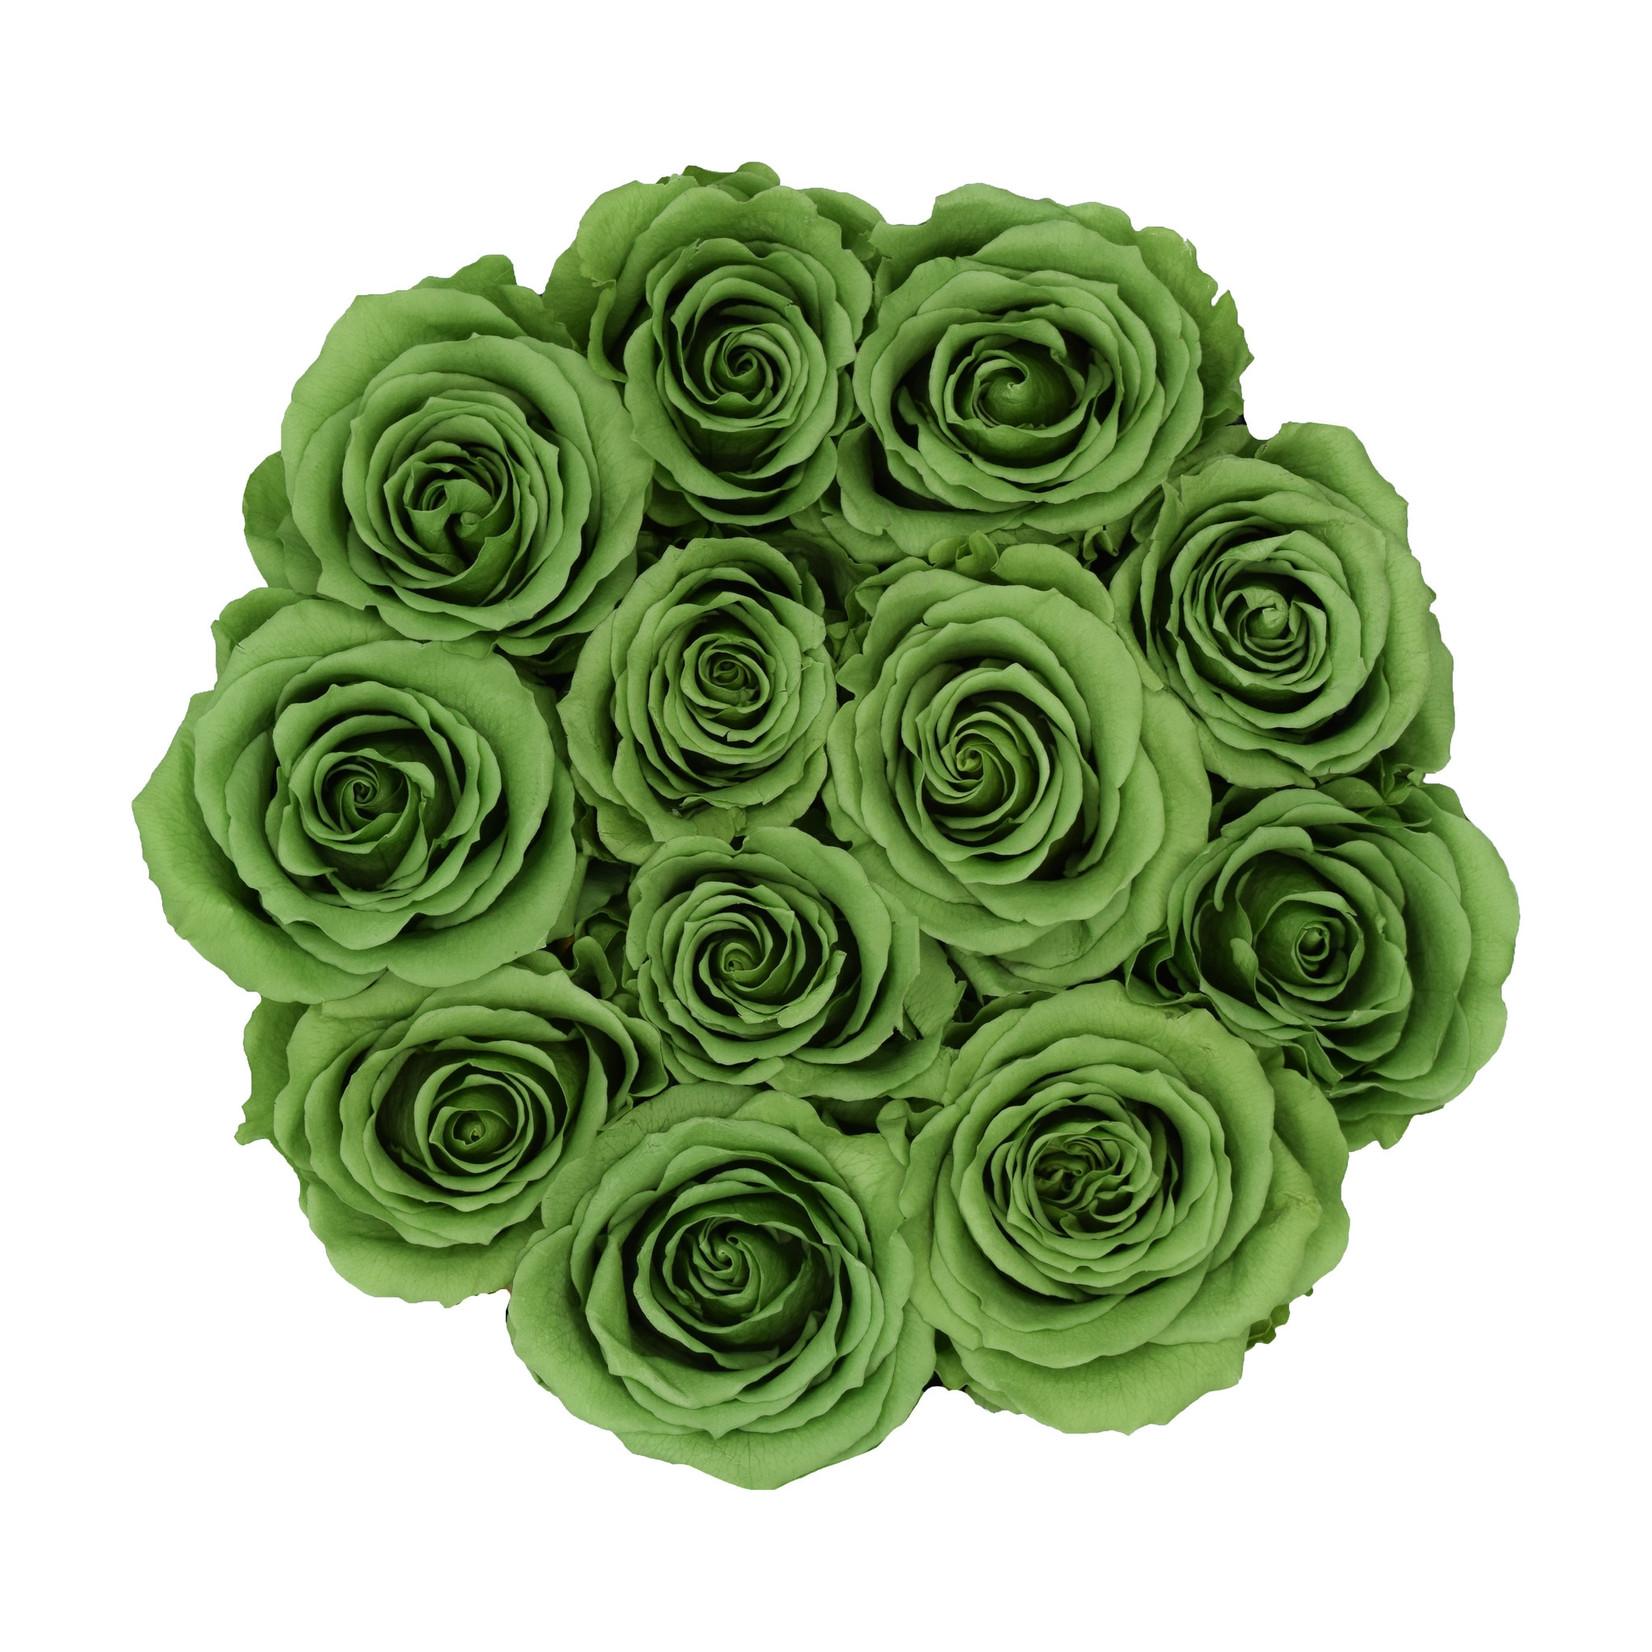 Small - Green Endless Roses - Black Box